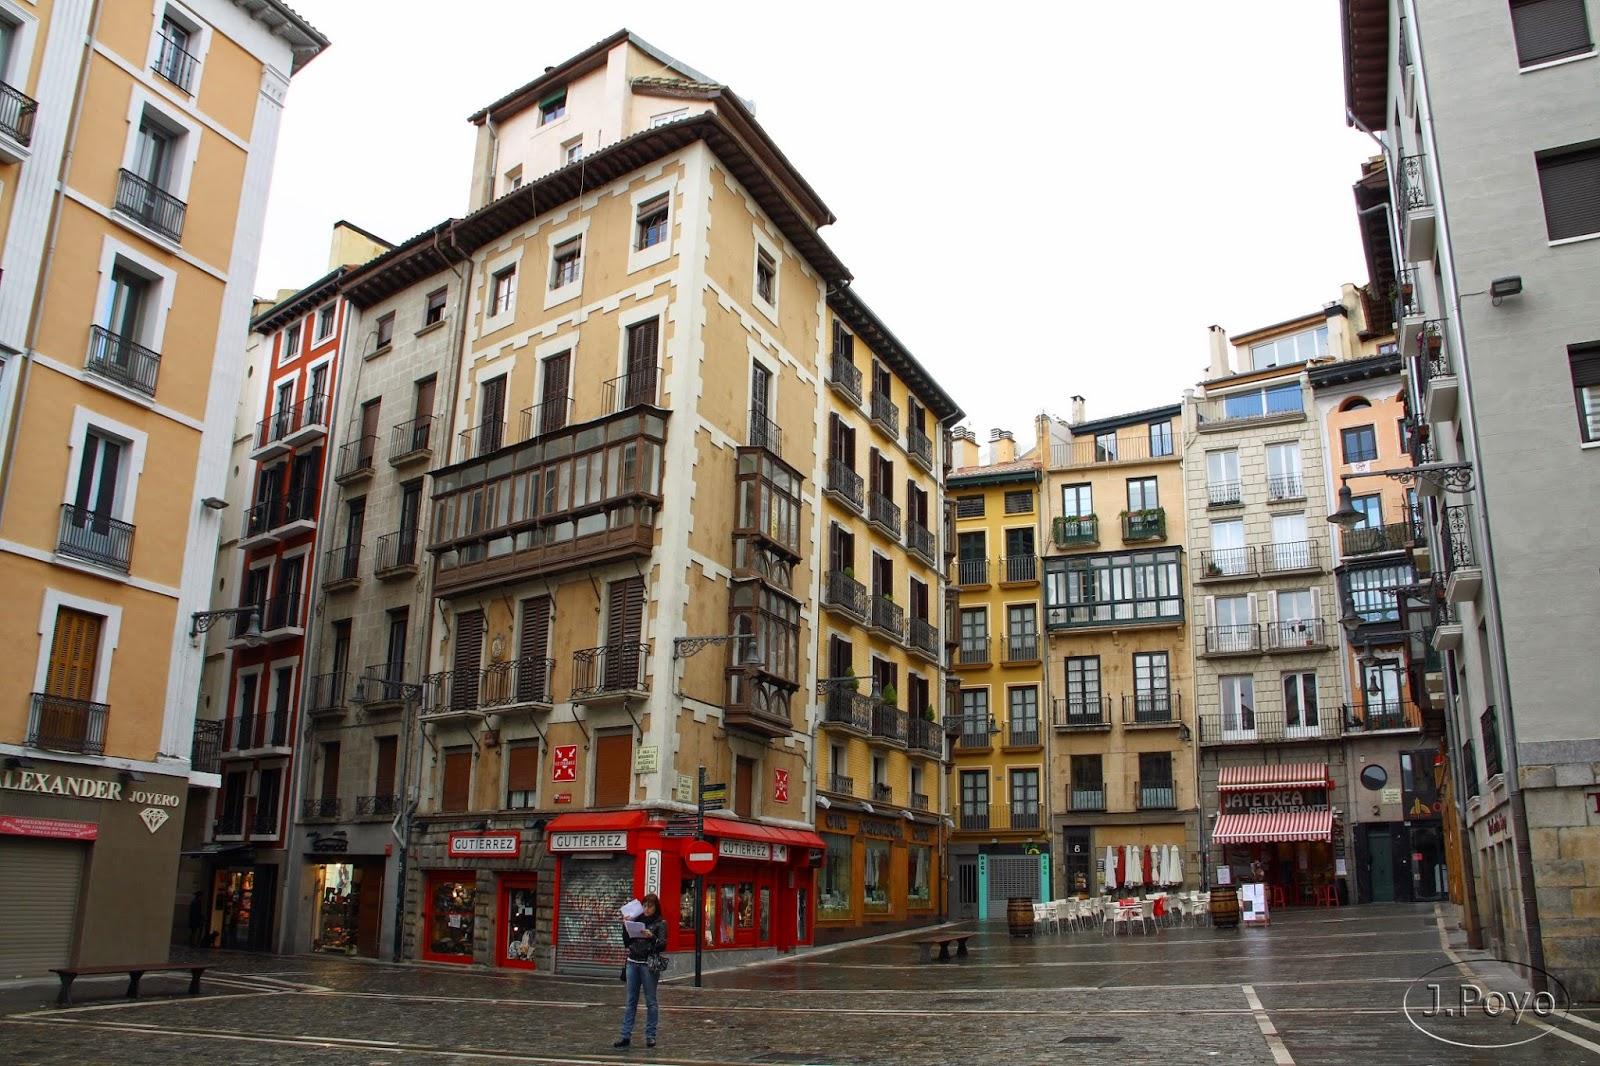 Calle mercaderes, Pamplona